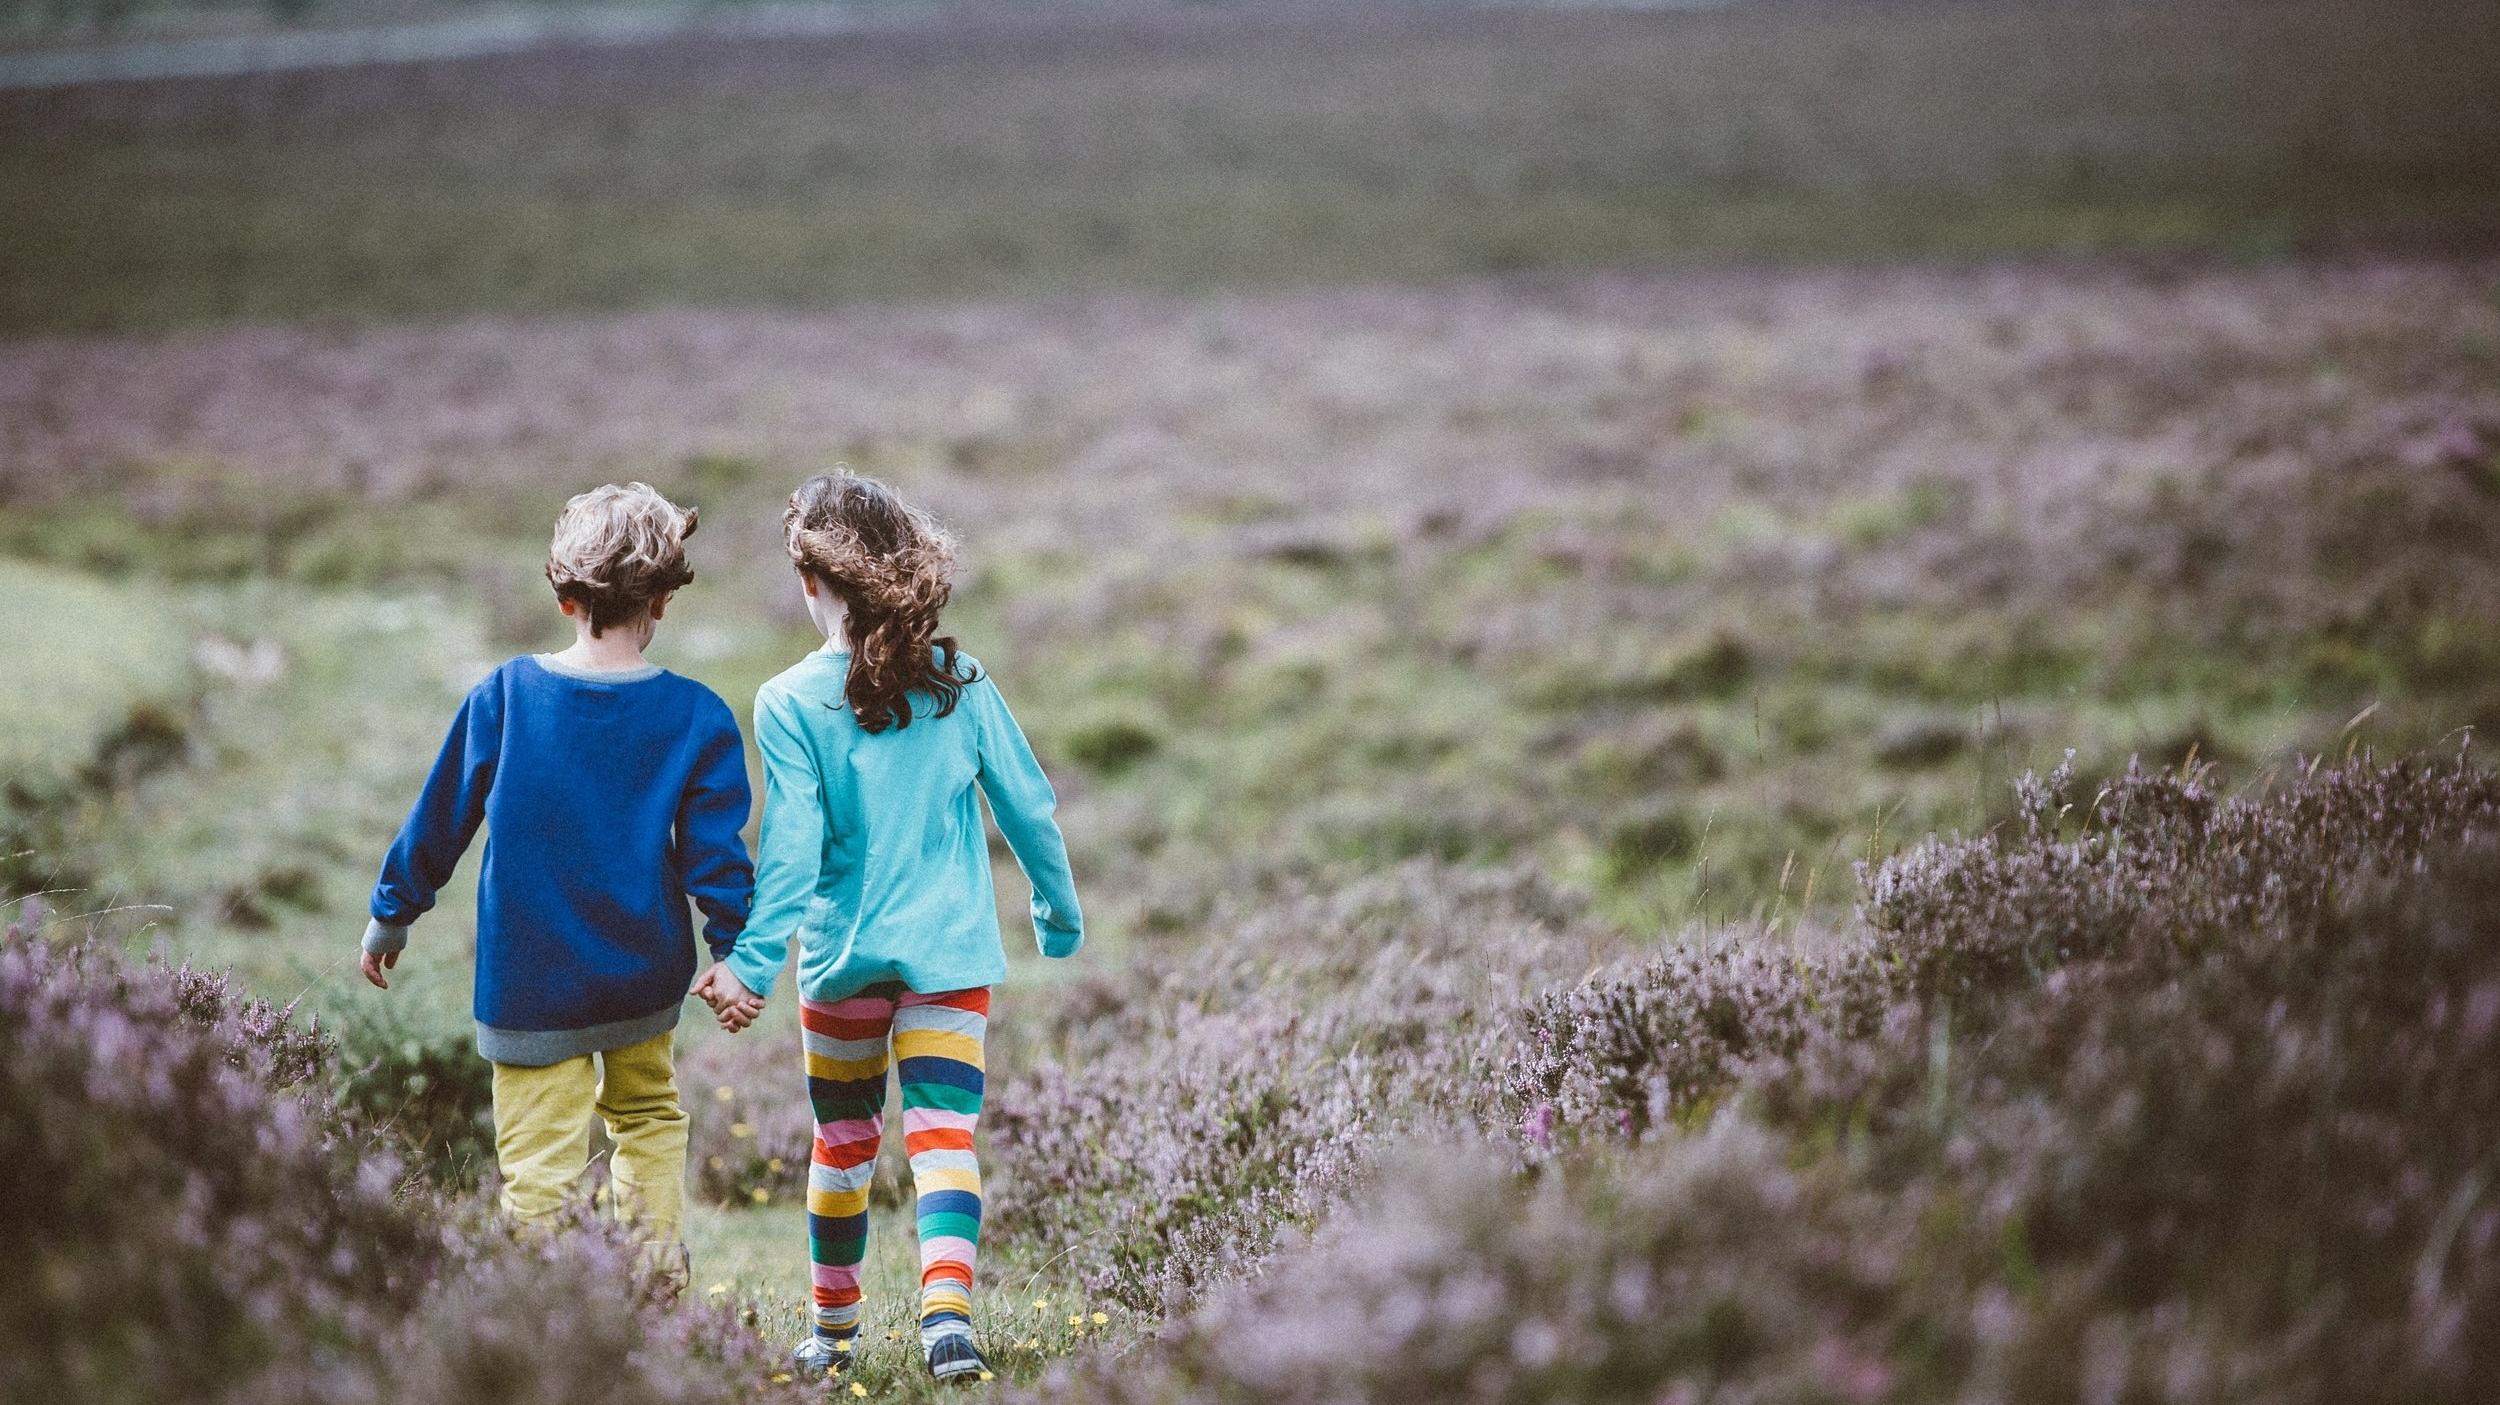 friendship connection relationships resilient children